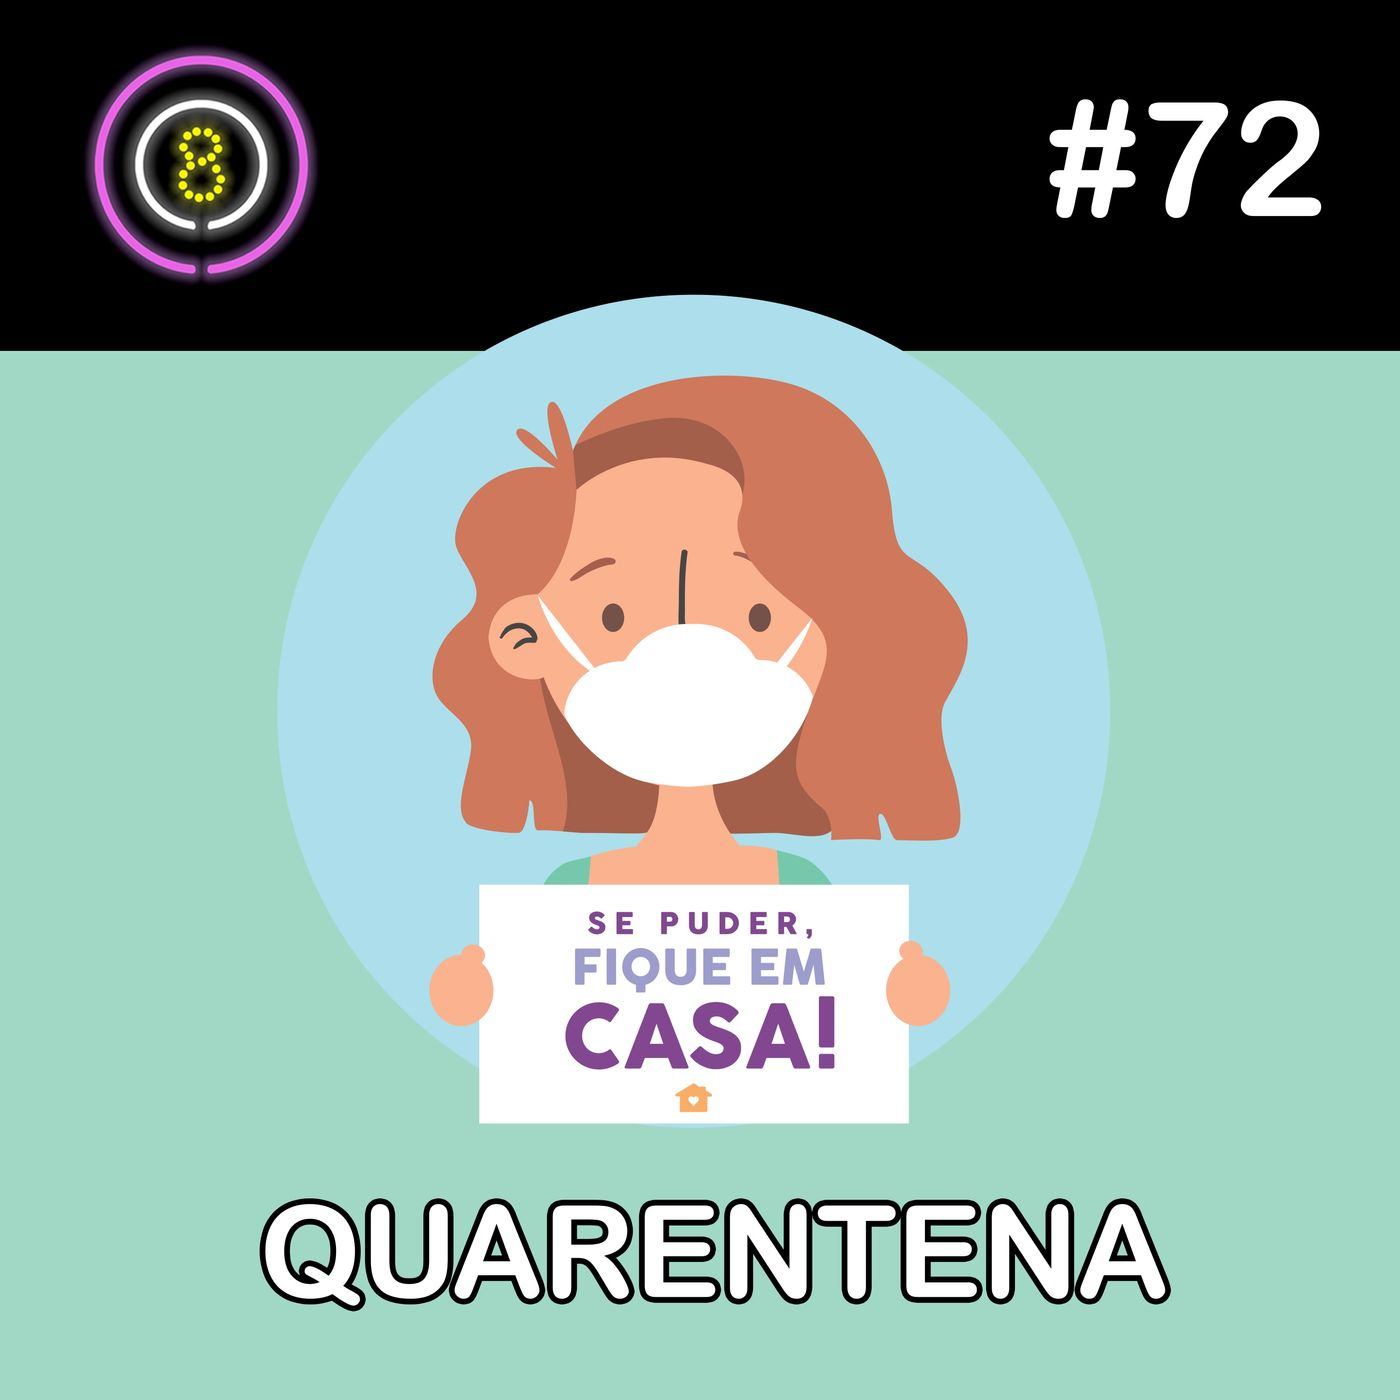 #72 - Quarentena